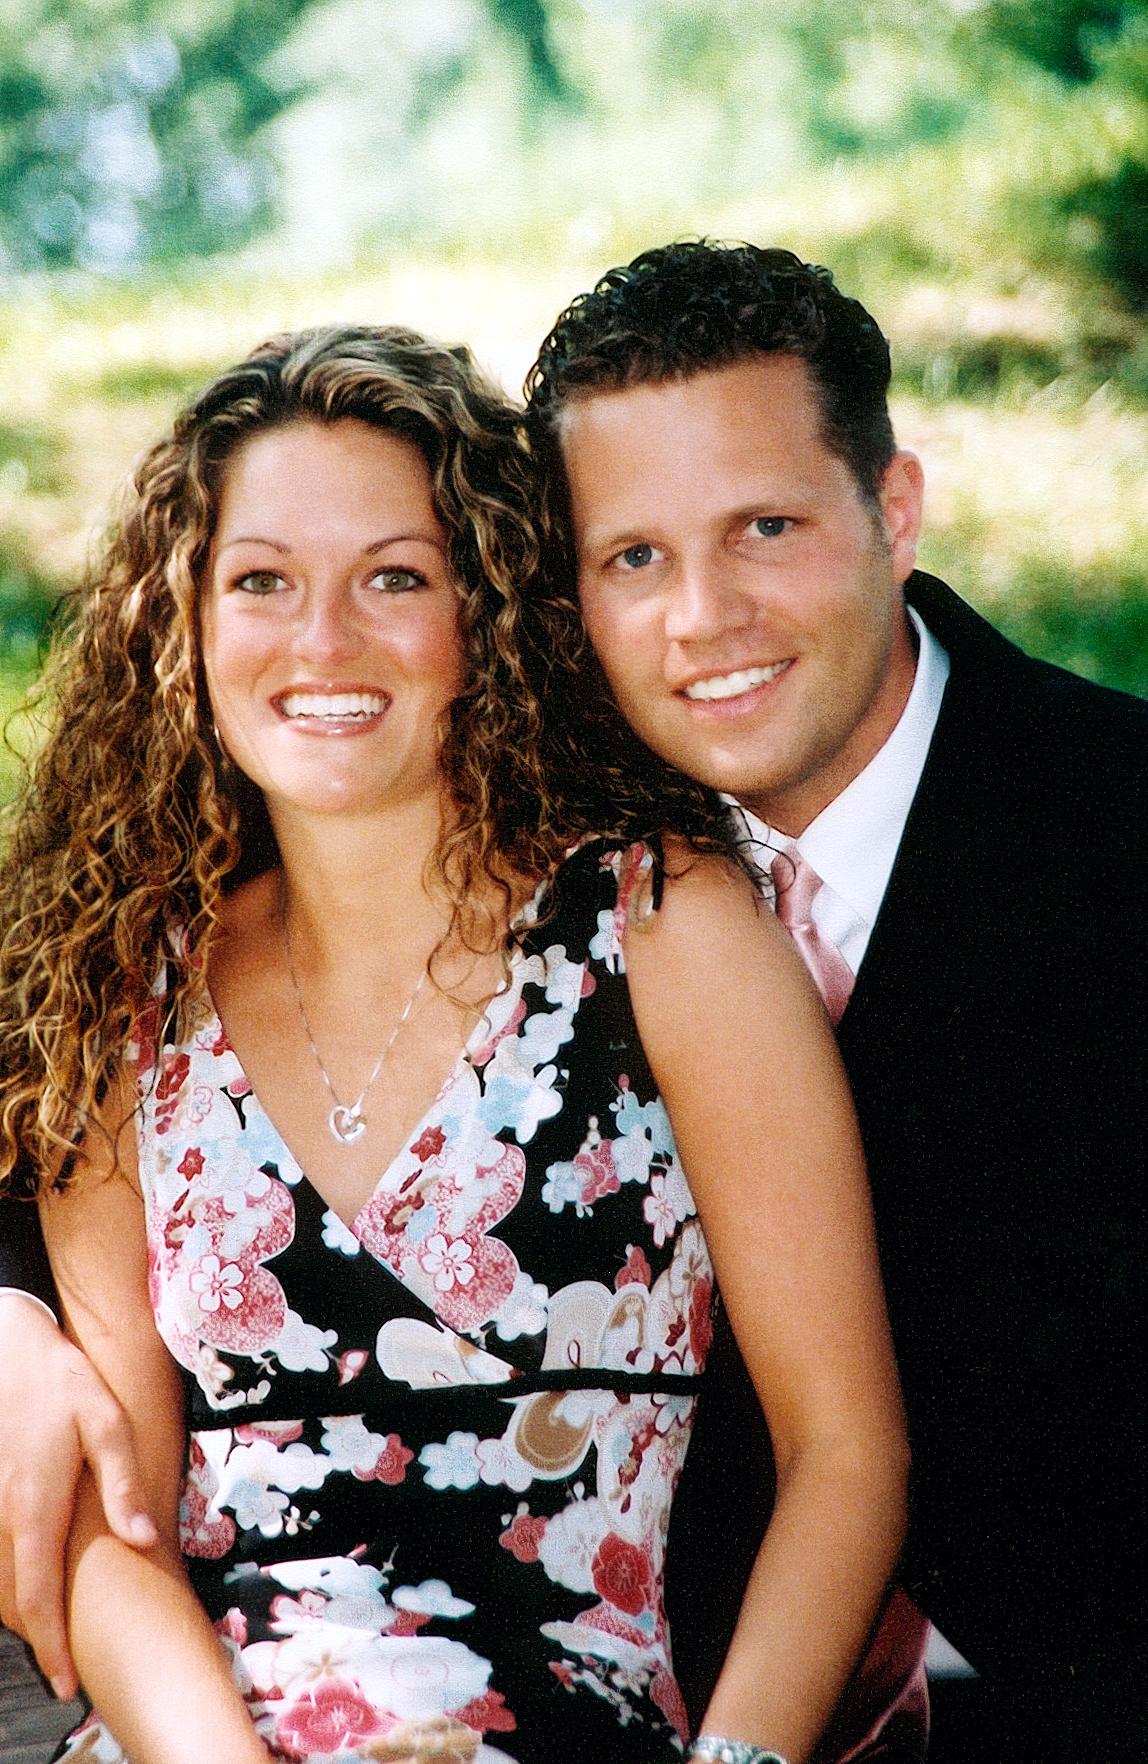 Matt & Angela 1st Min Picture 2004.jpg